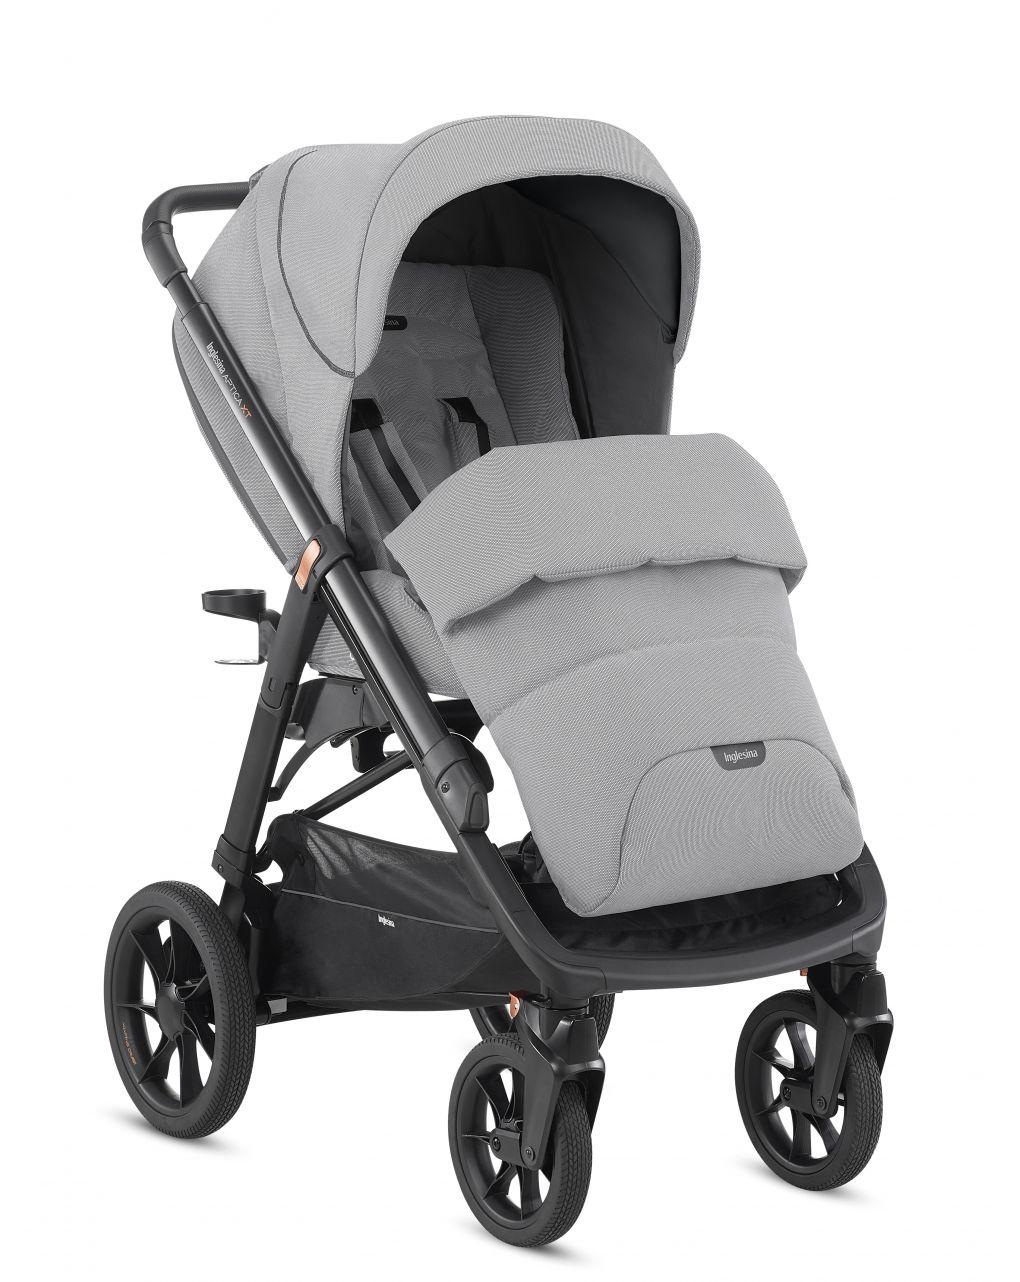 Inglesina Σύστημα Μεταφοράς Aptica XT Quattro Horizon Grey με κάθισμα αυτοκινήτου Cab